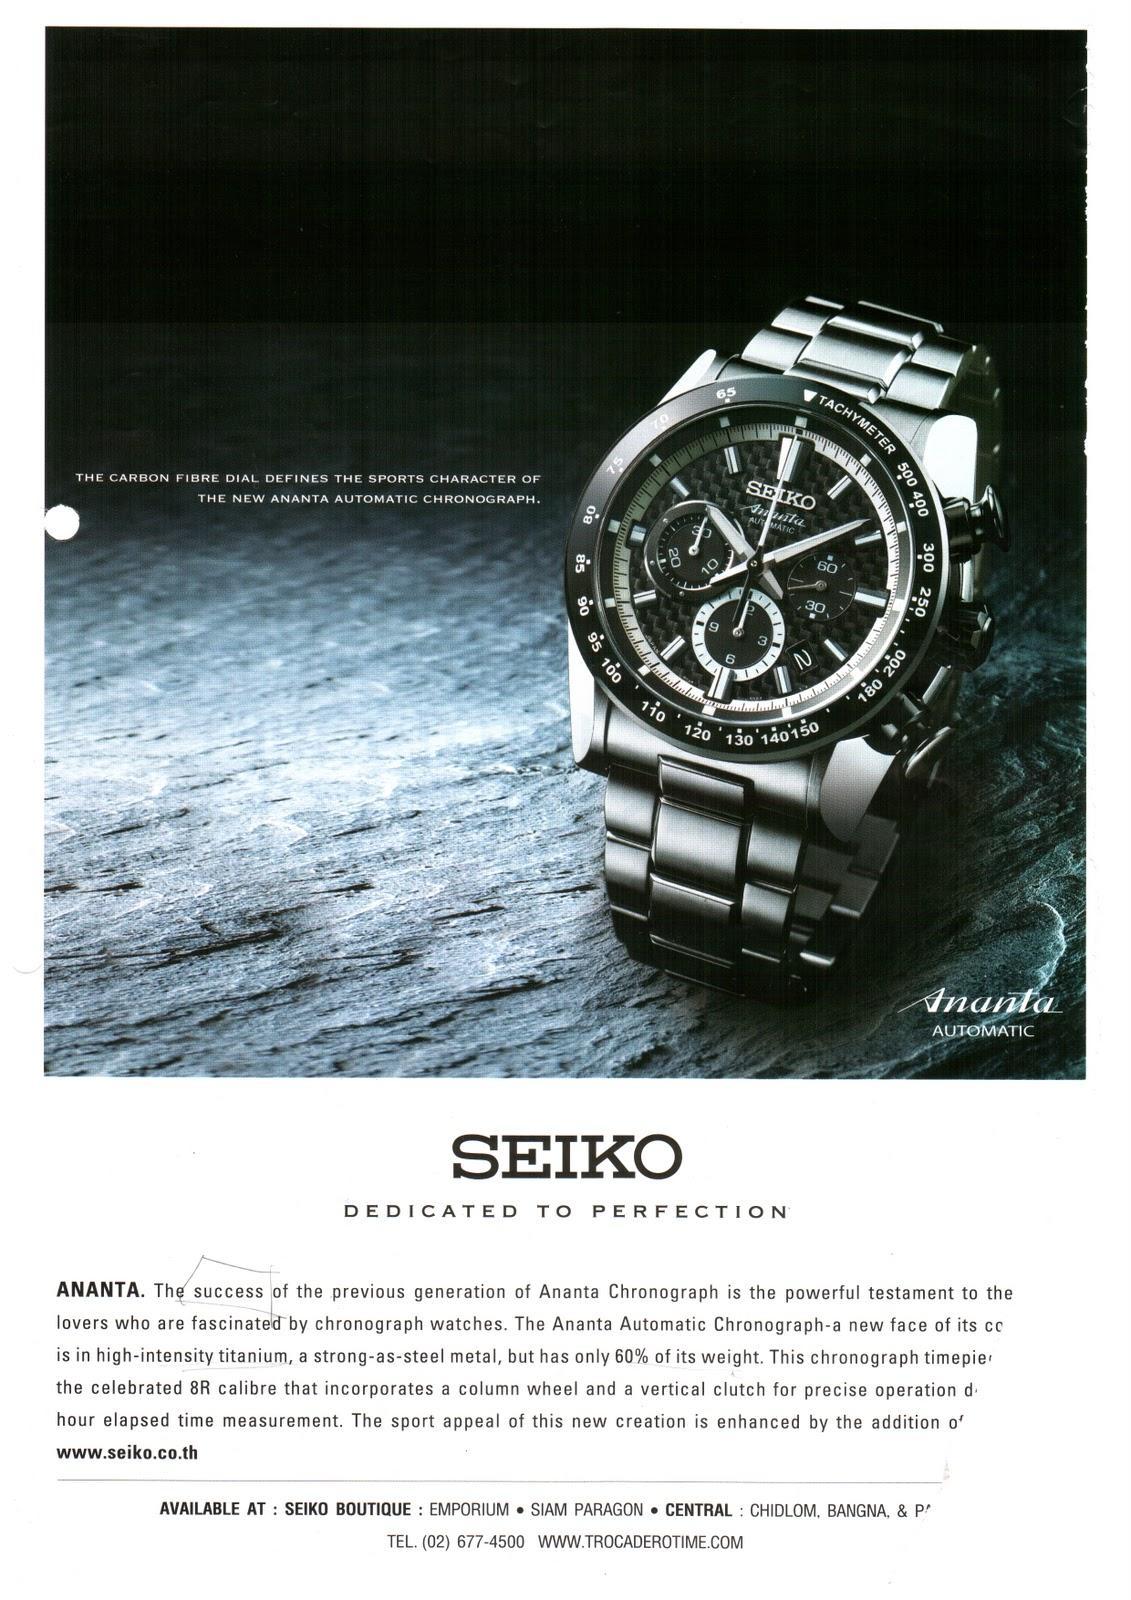 Seiko.jpg (1131×1600)